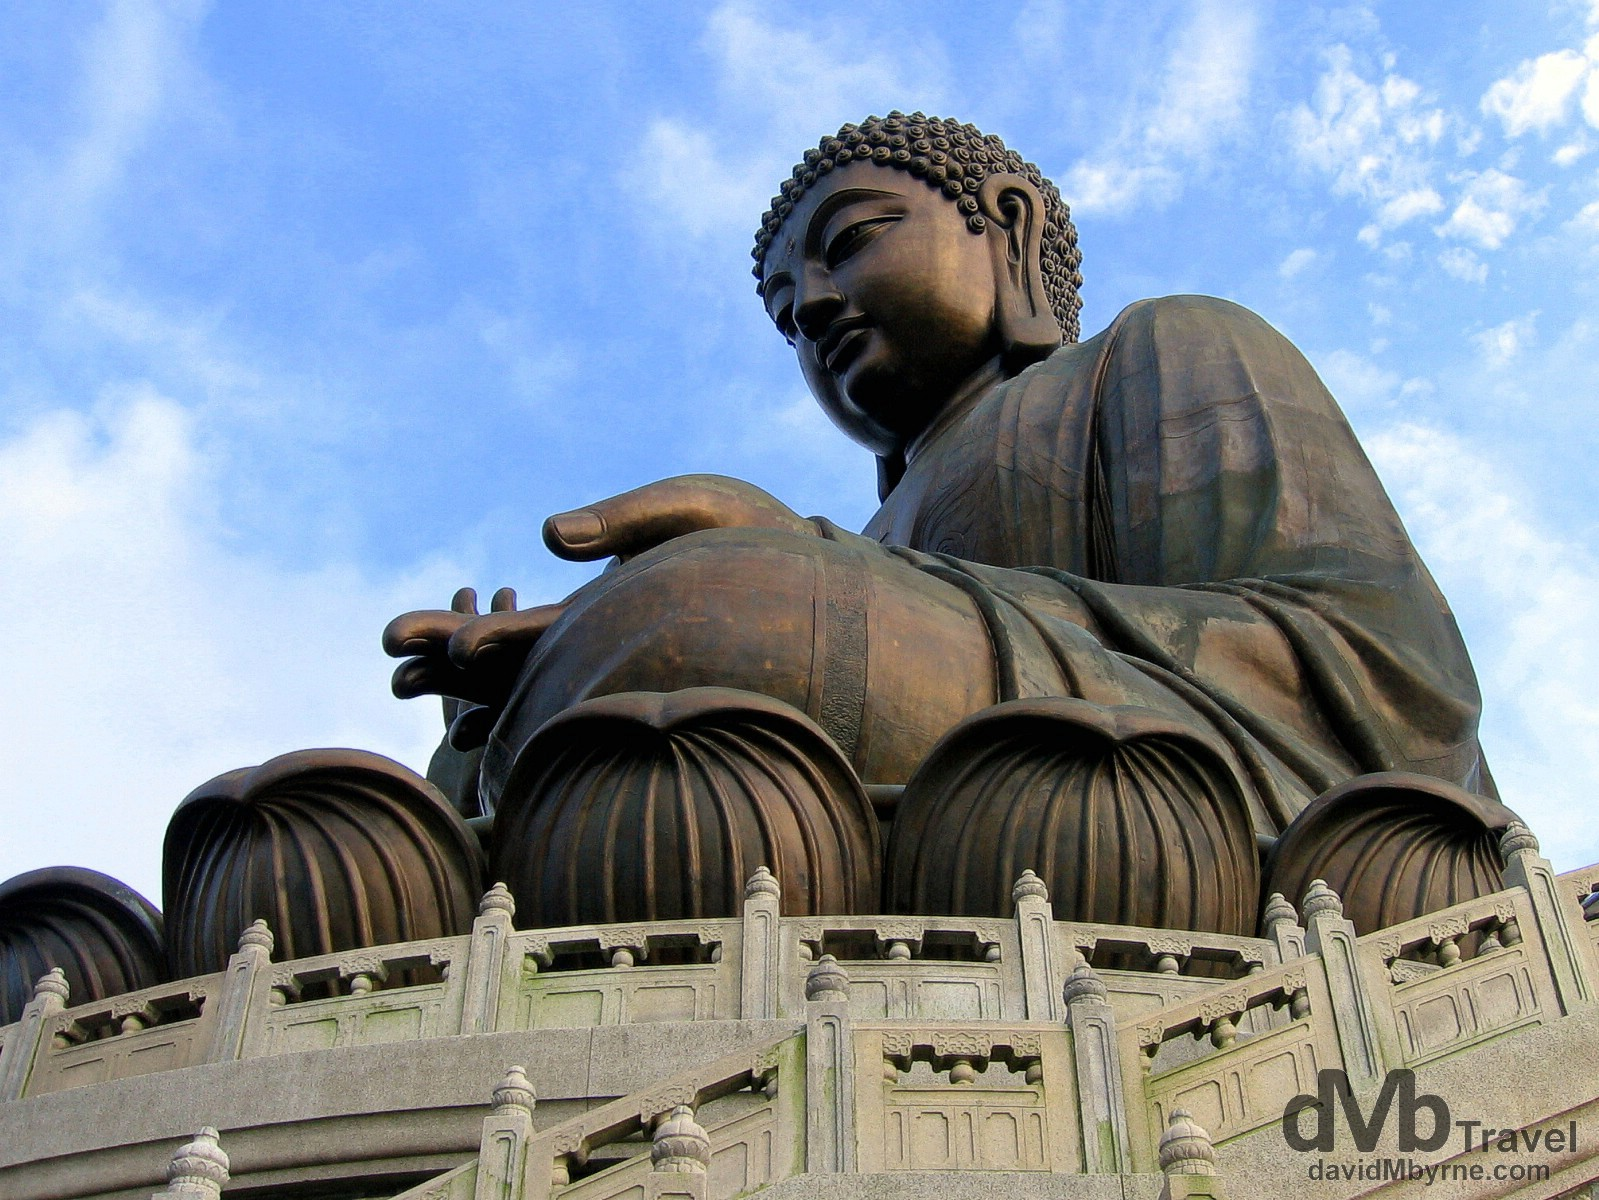 Tian Tan Buddha, Lantau Island, Hong Kong, China. August 27th 2005.